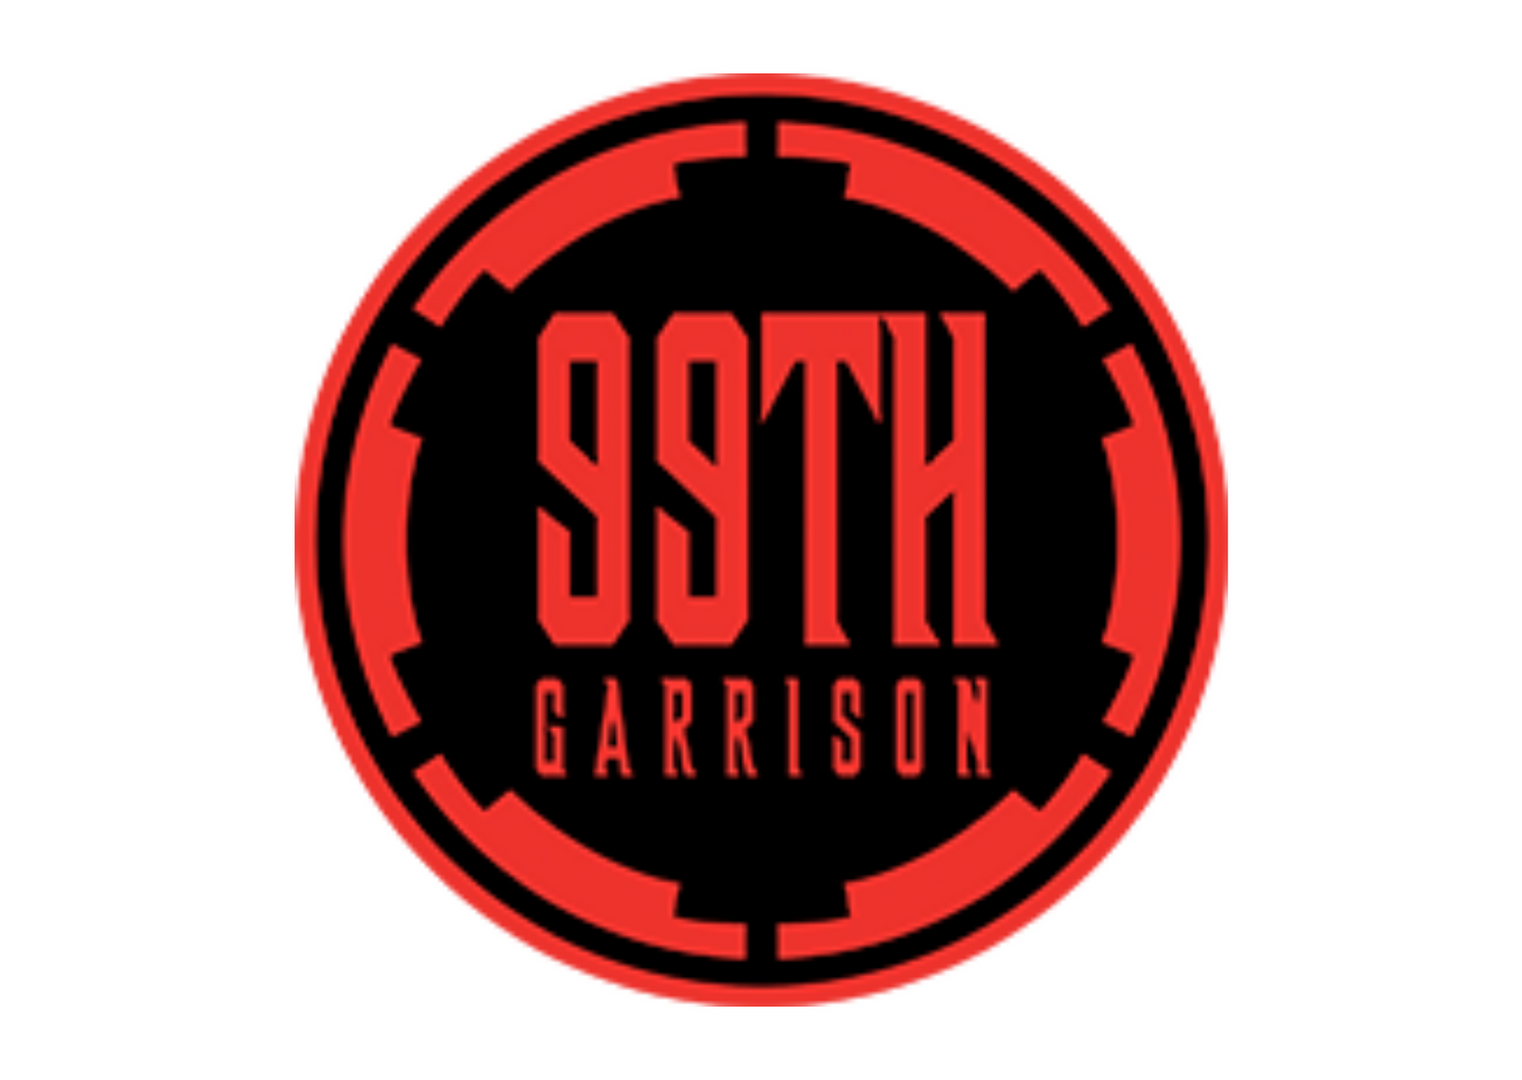 Web 99th Garrison.png